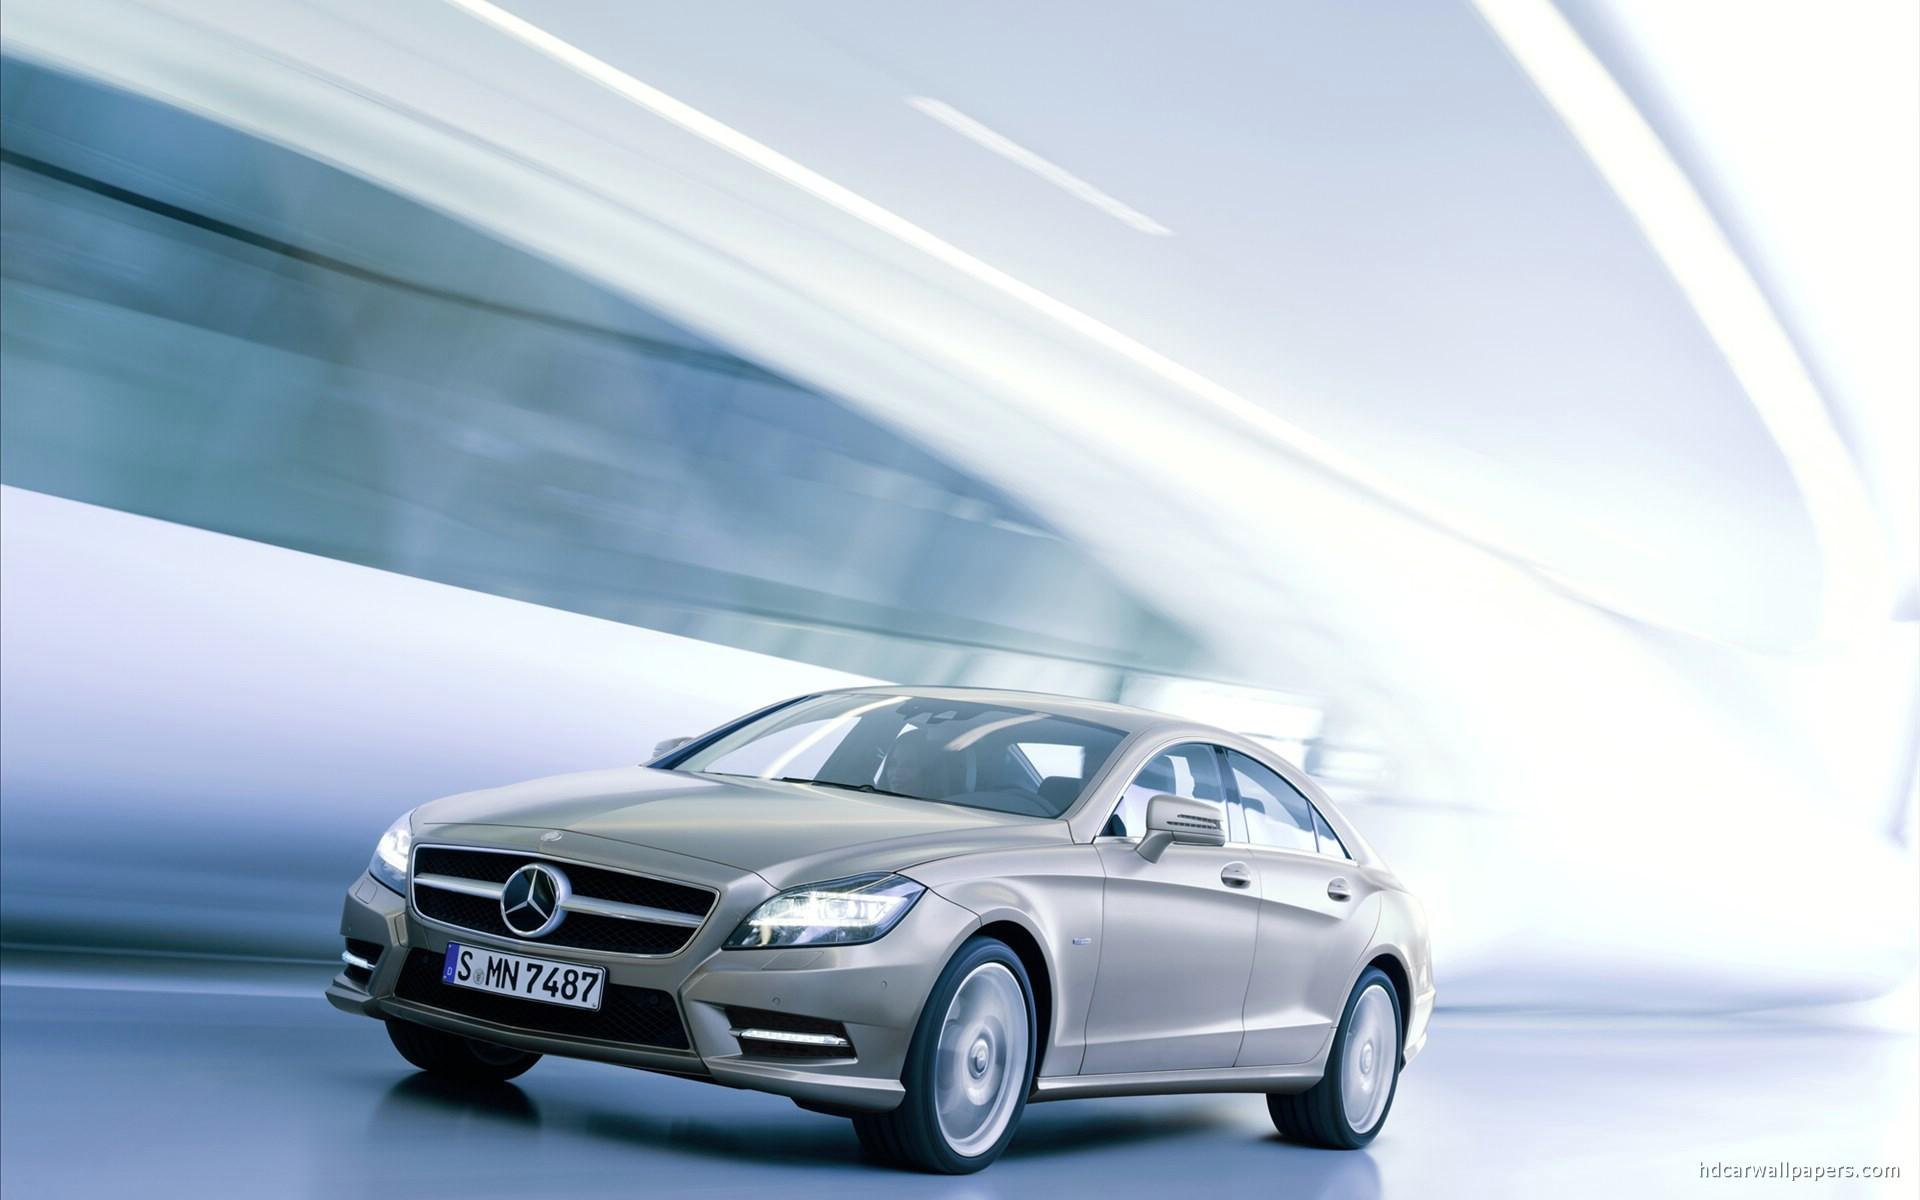 2012 Mercedes Benz CLS550 Wallpaper in 1920x1200 Resolution